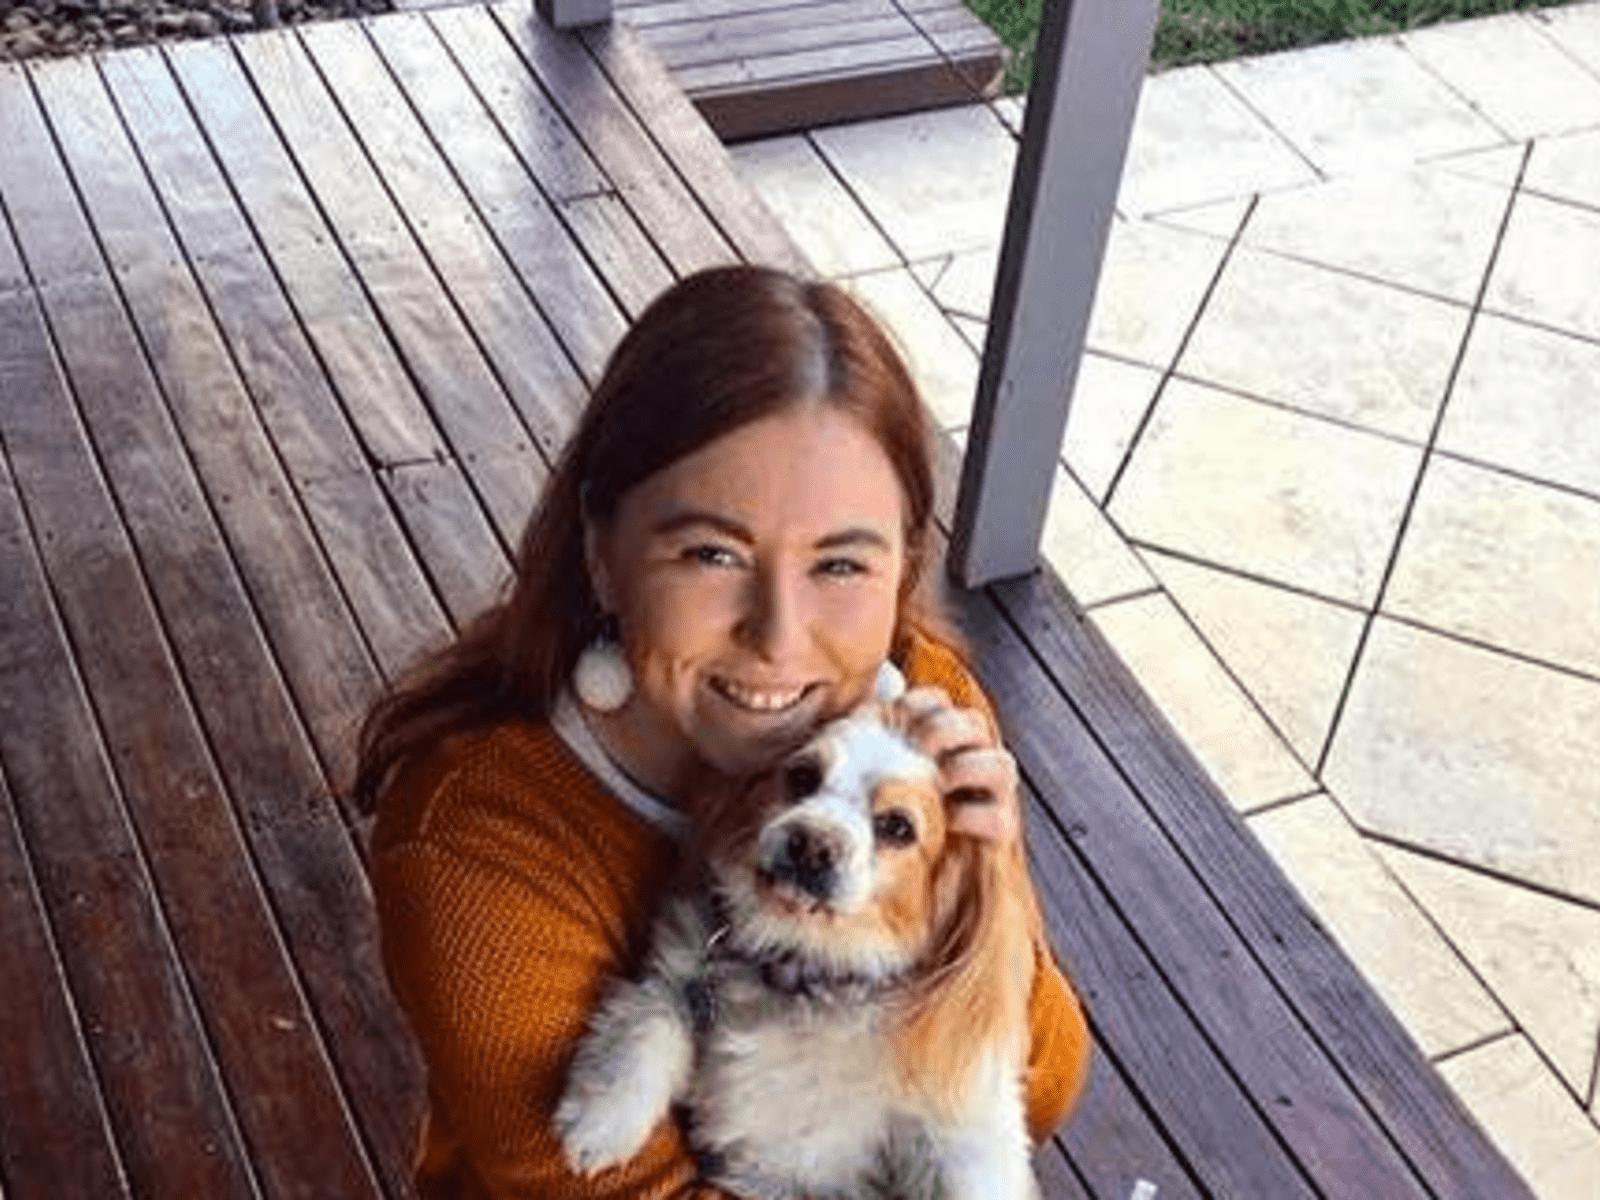 Sasha from Lake Cathie, New South Wales, Australia